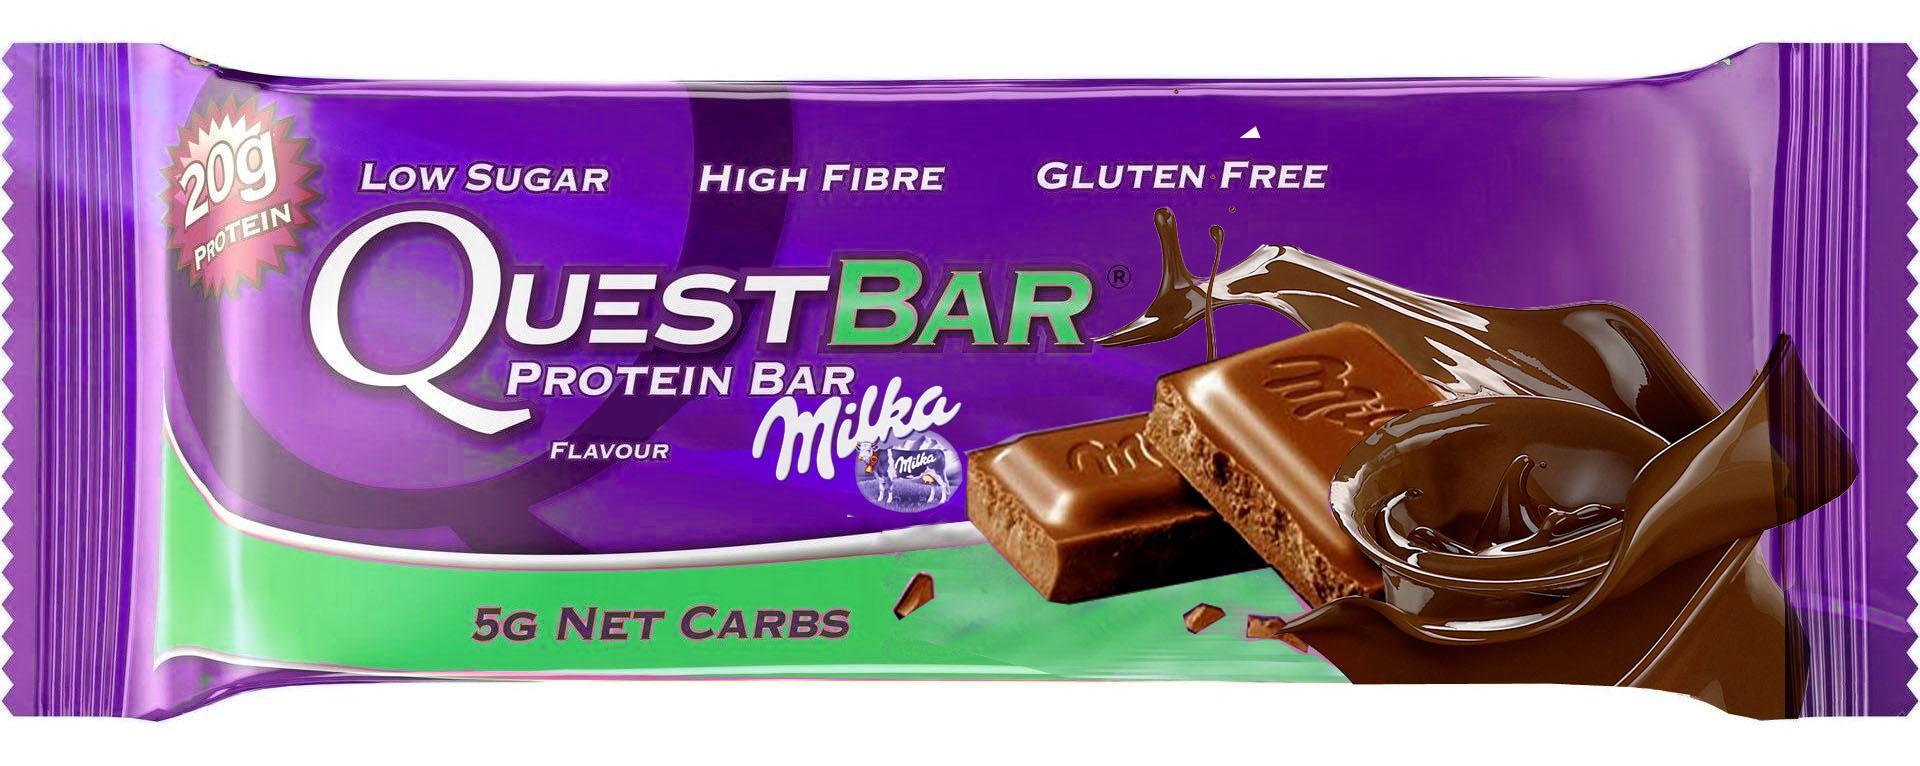 Homemade Quest Bar Milka flavor